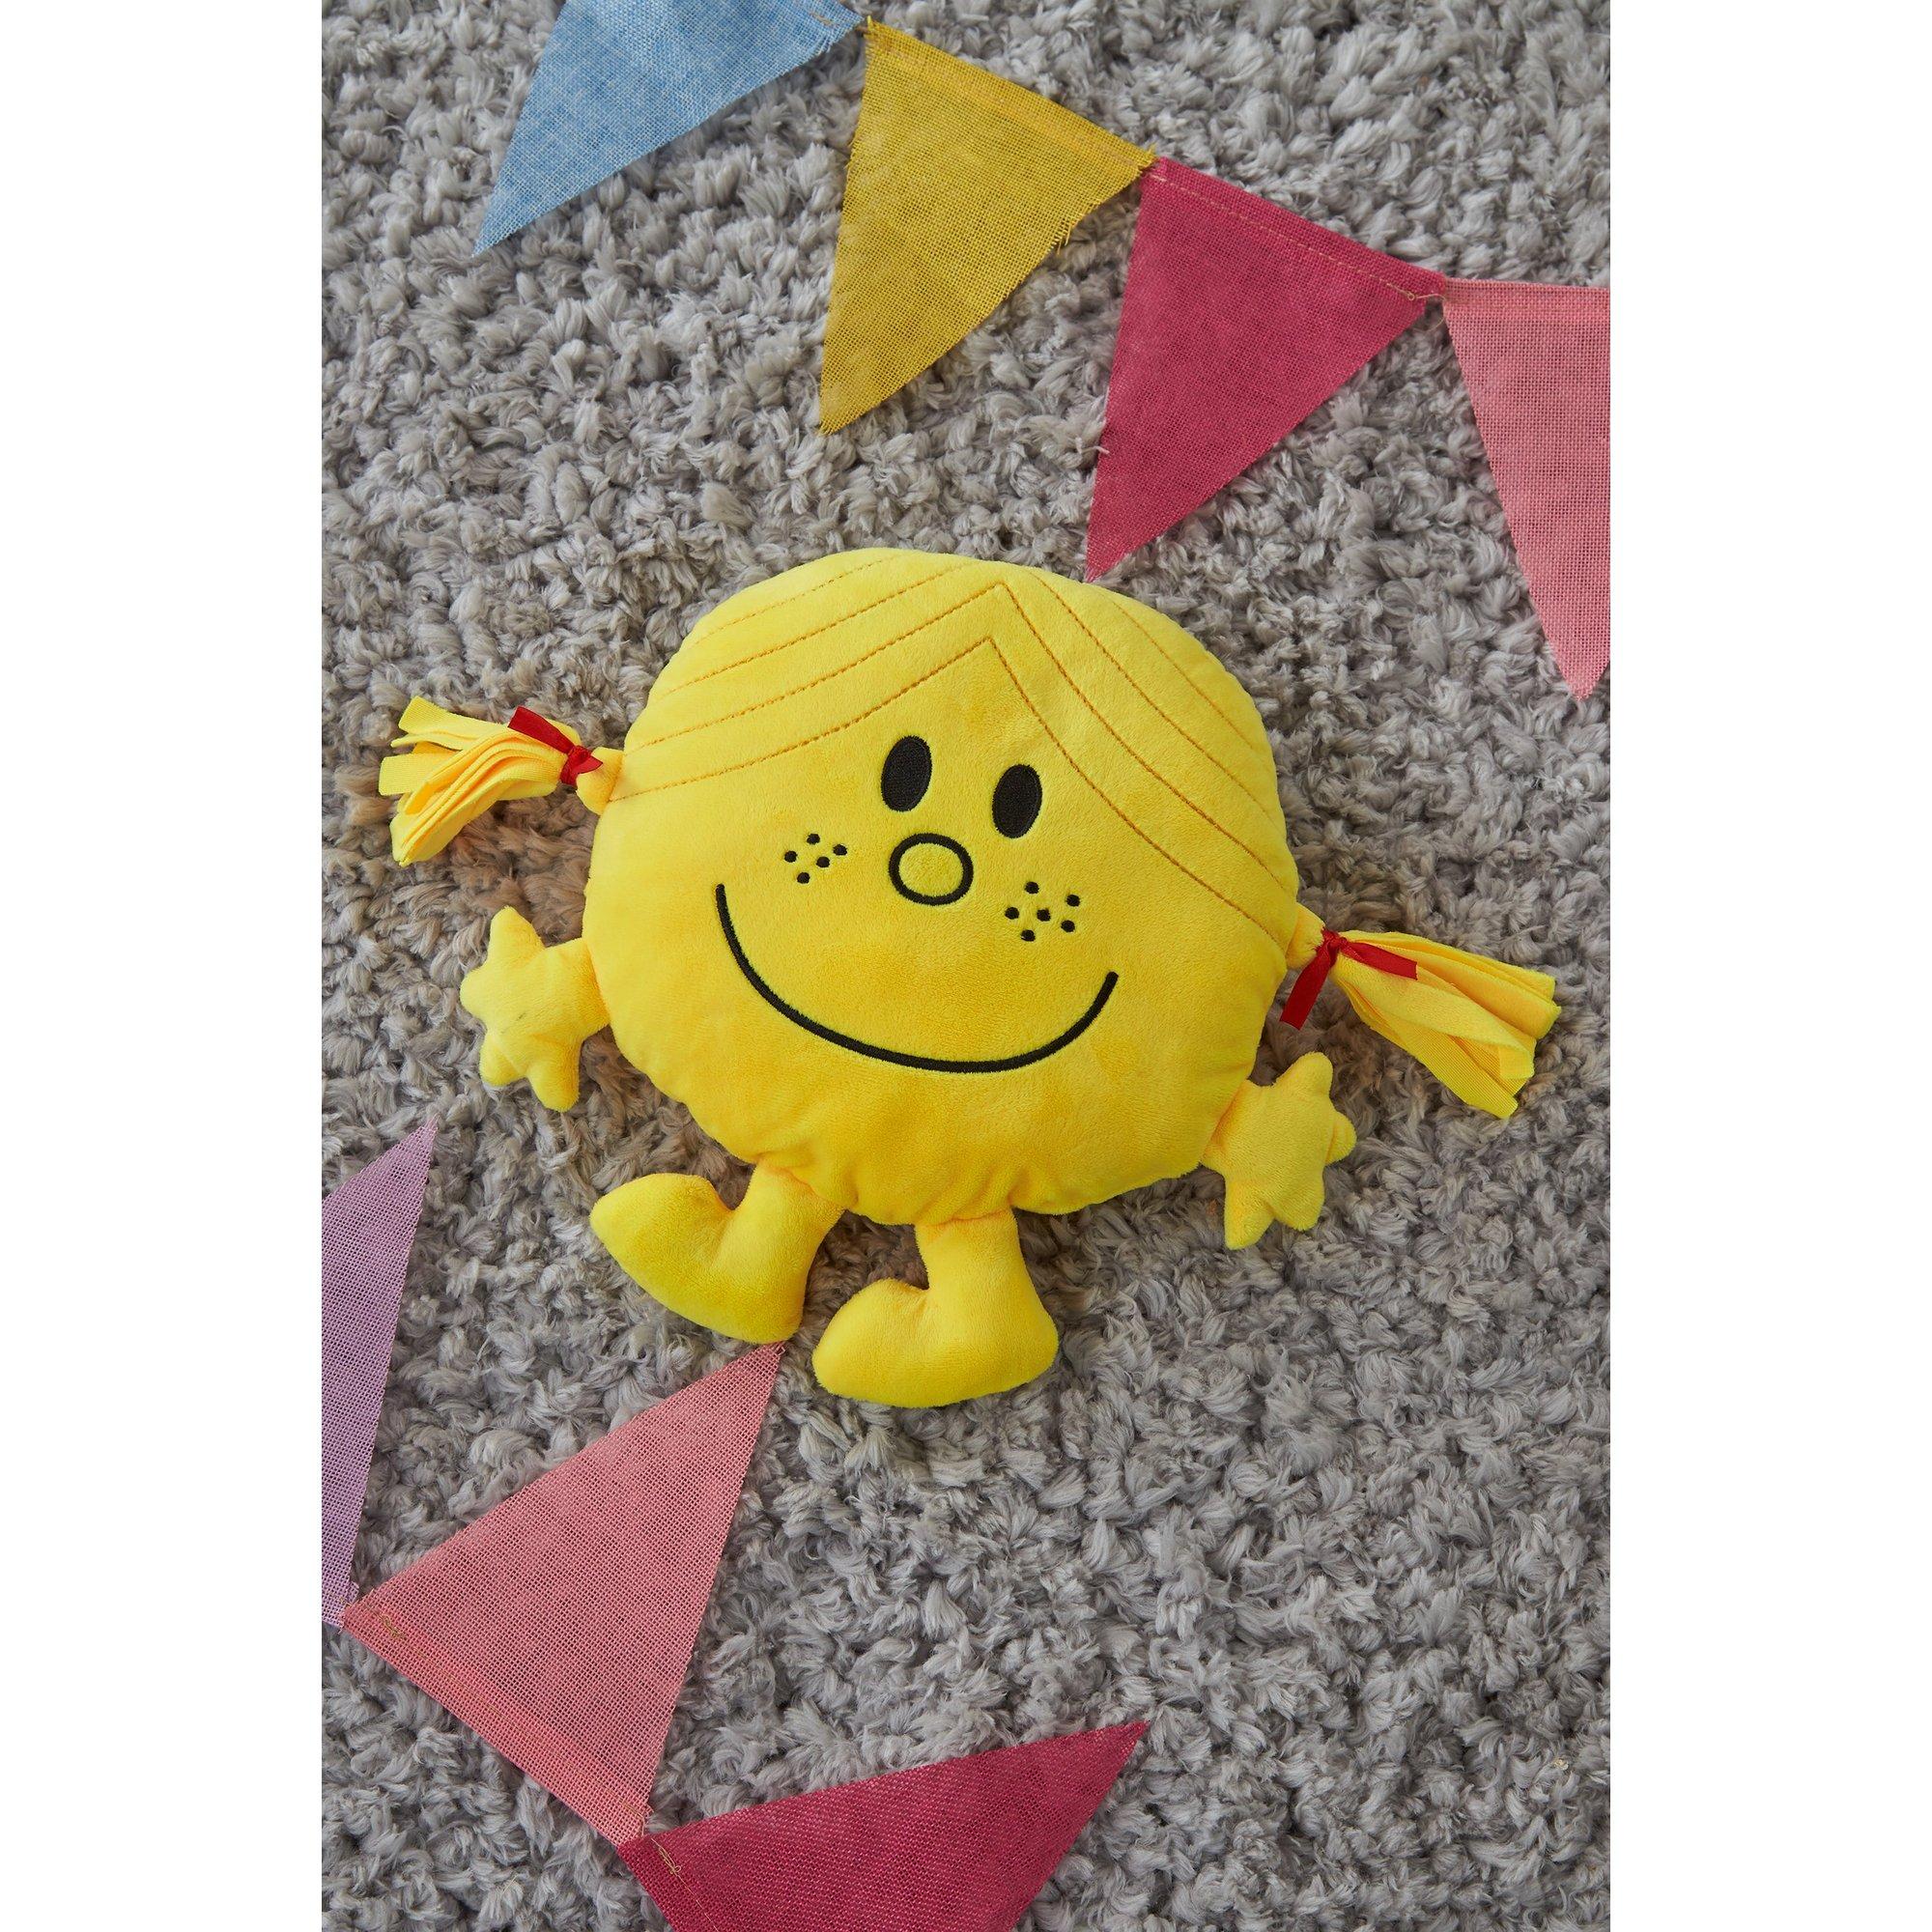 Image of Heatable Mr Men Little Miss Sunshine Plush